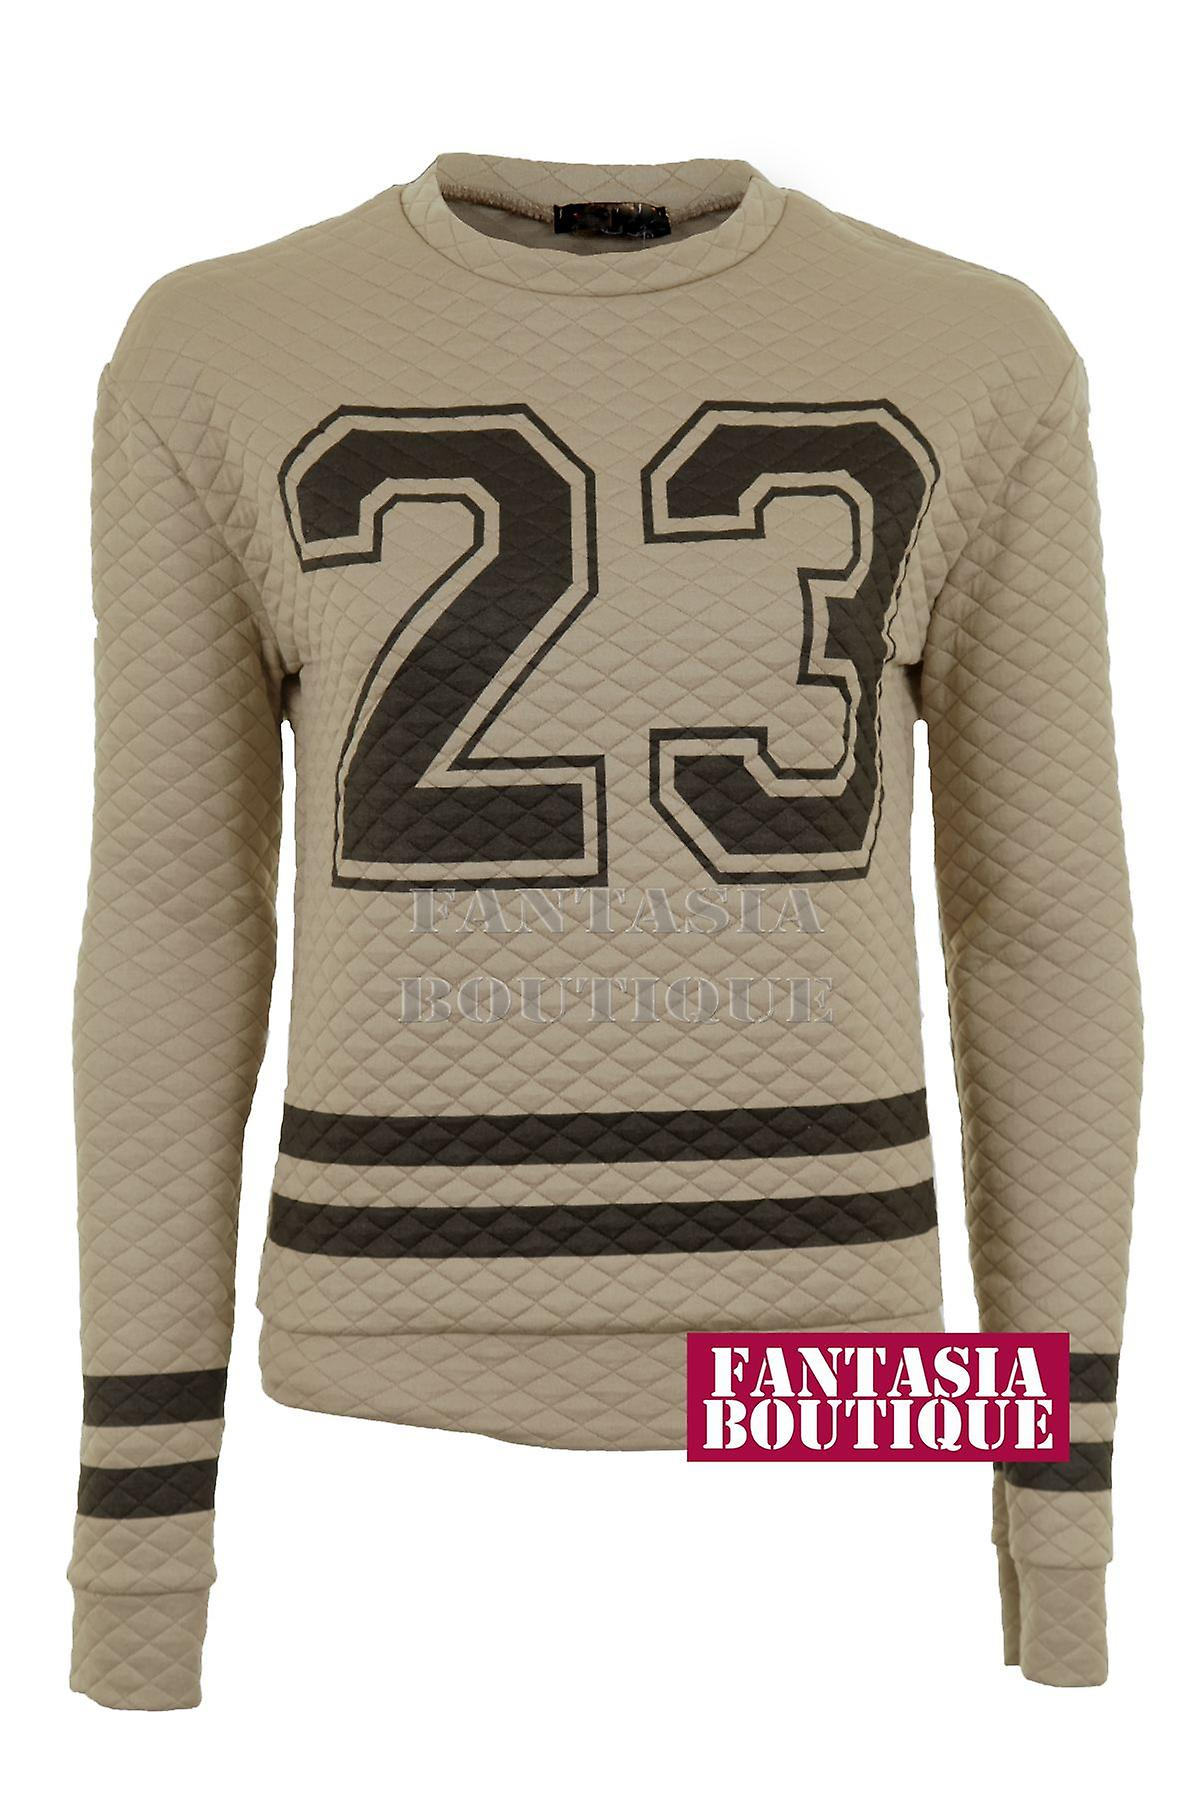 Damen Langarm gesteppte Baseball schwarz 23 Print Warme Damen Pullover